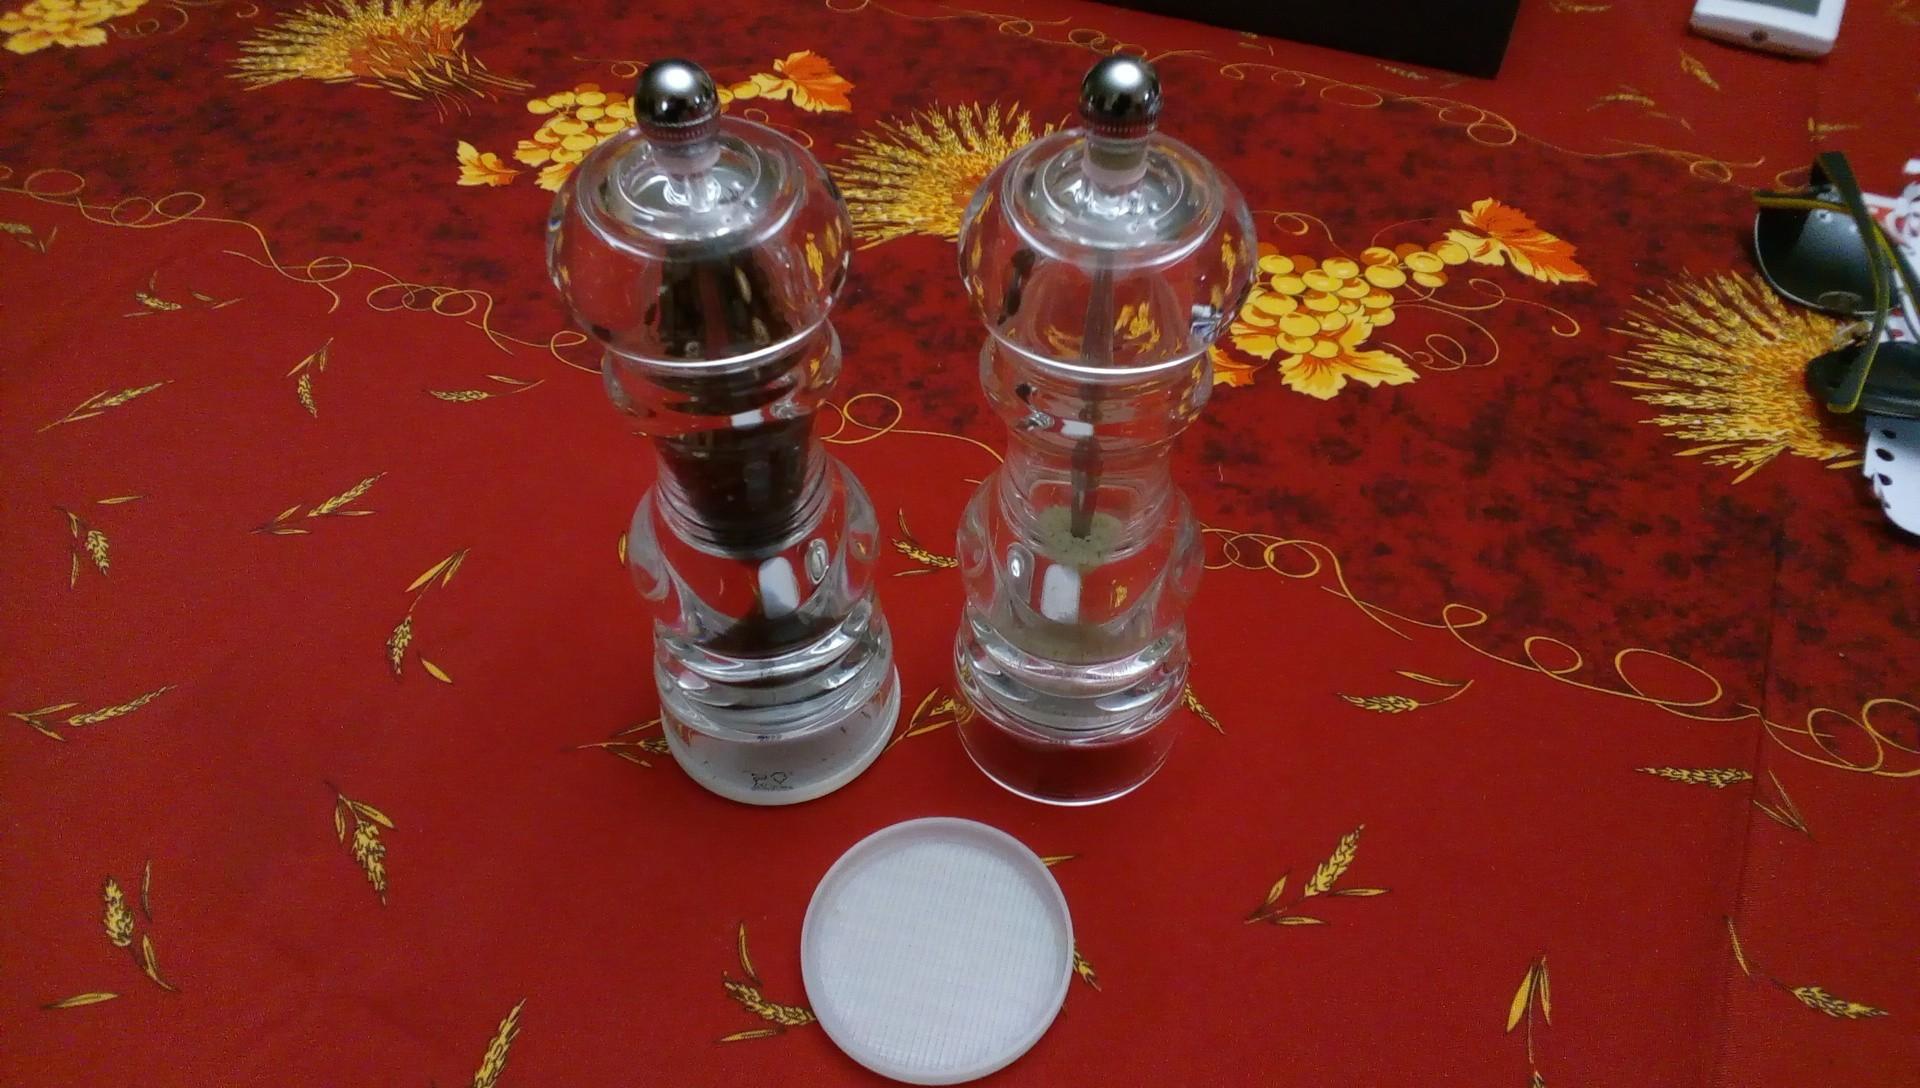 P81011-205311.jpg Download free STL file Cover for Peugeot salt and pepper shakers • 3D printing design, Algernon